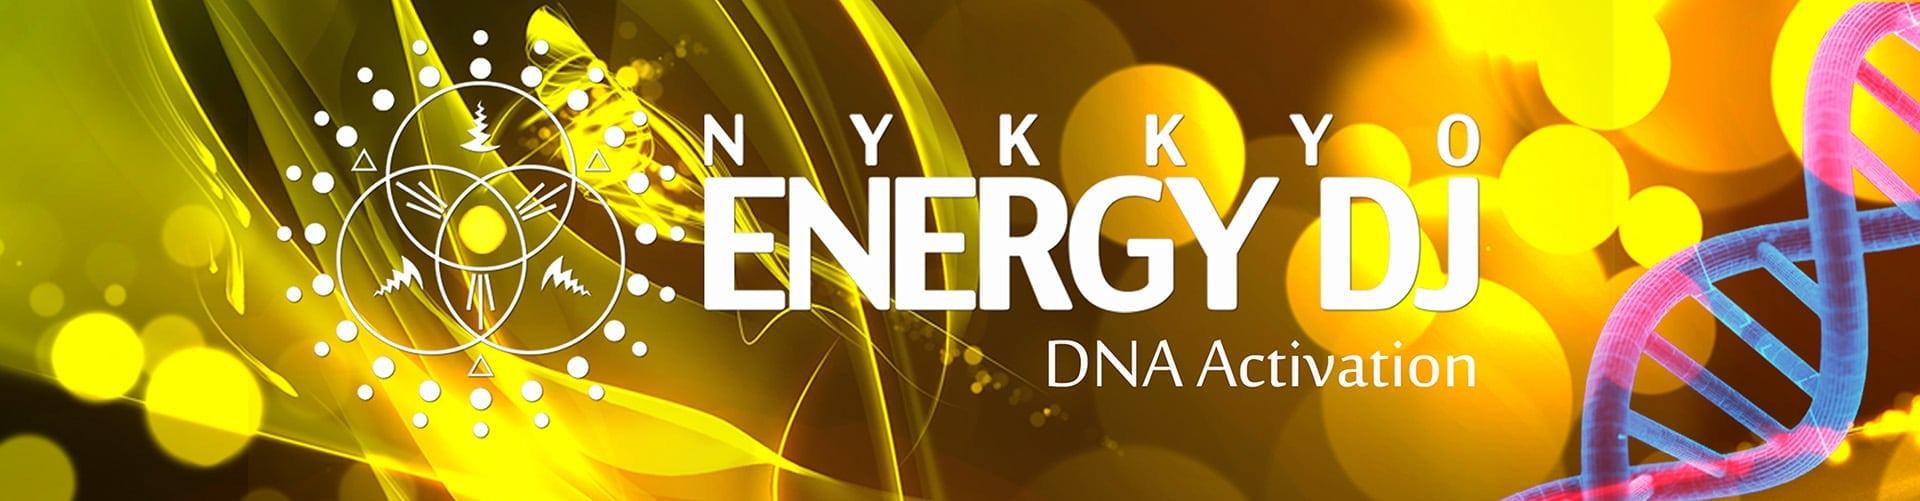 Nykkyo Energy DJ